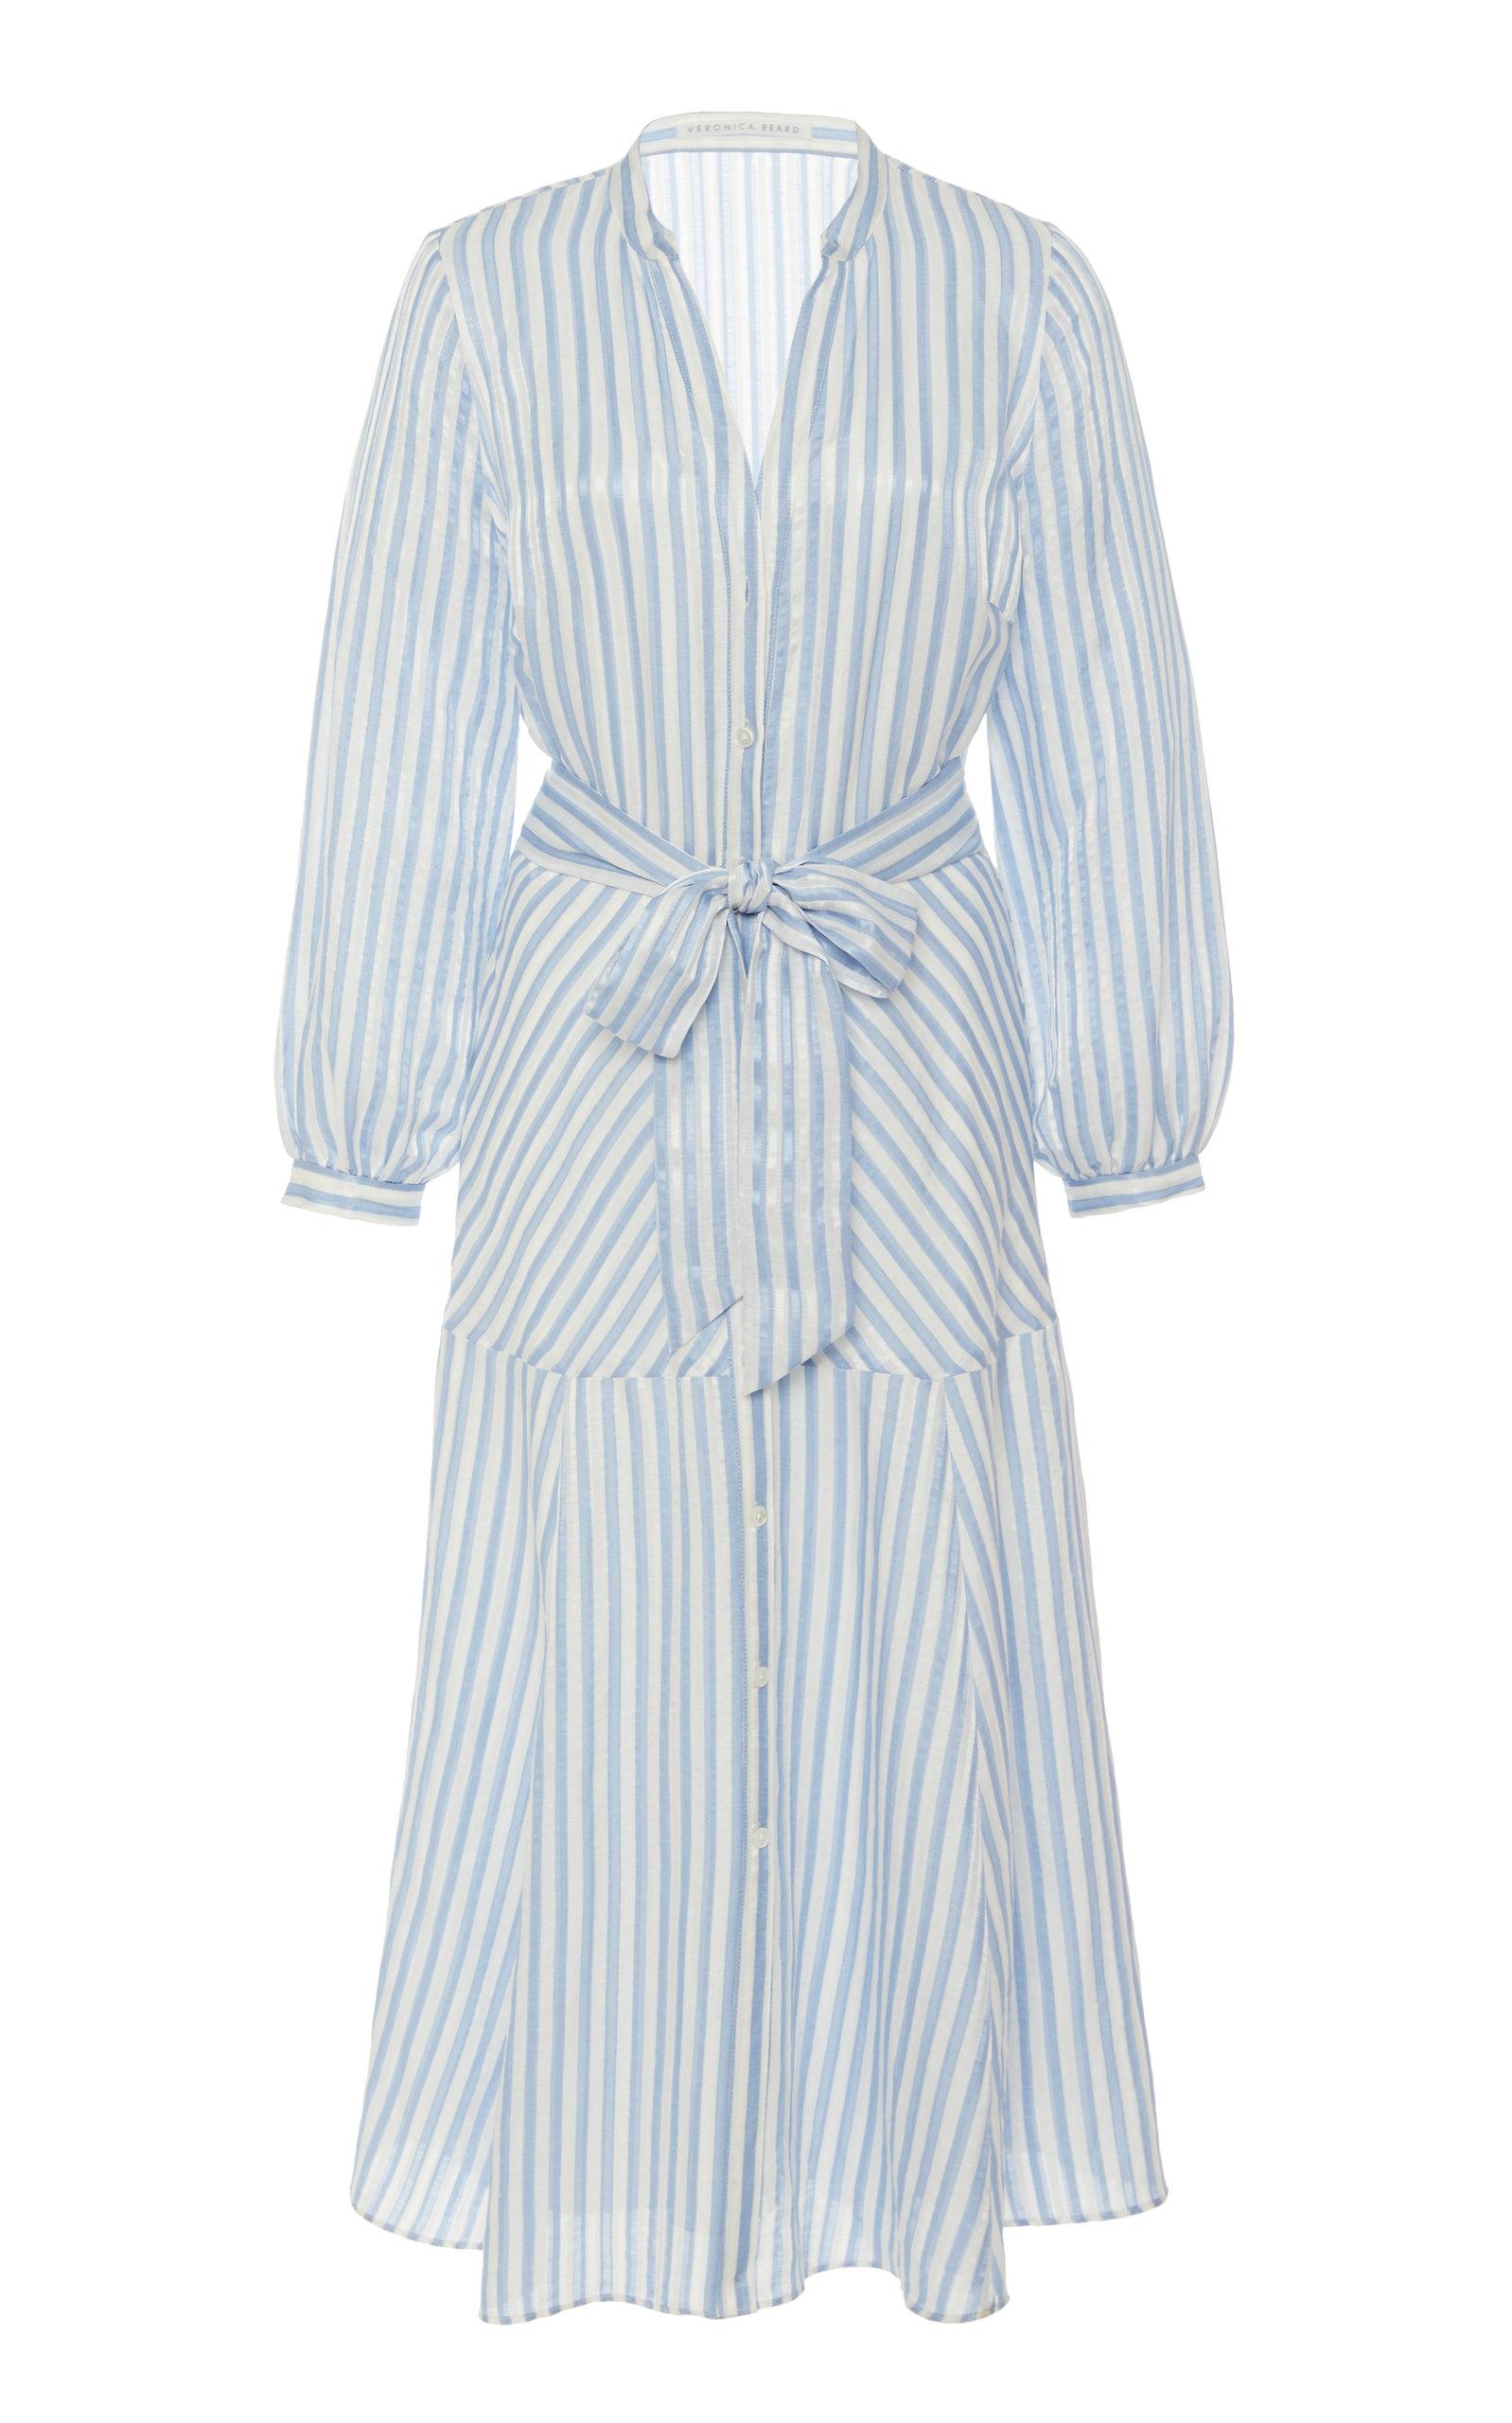 Buy Veronica Beard Jenna Striped Wrap Dress online, shop Veronica Beard at the best price